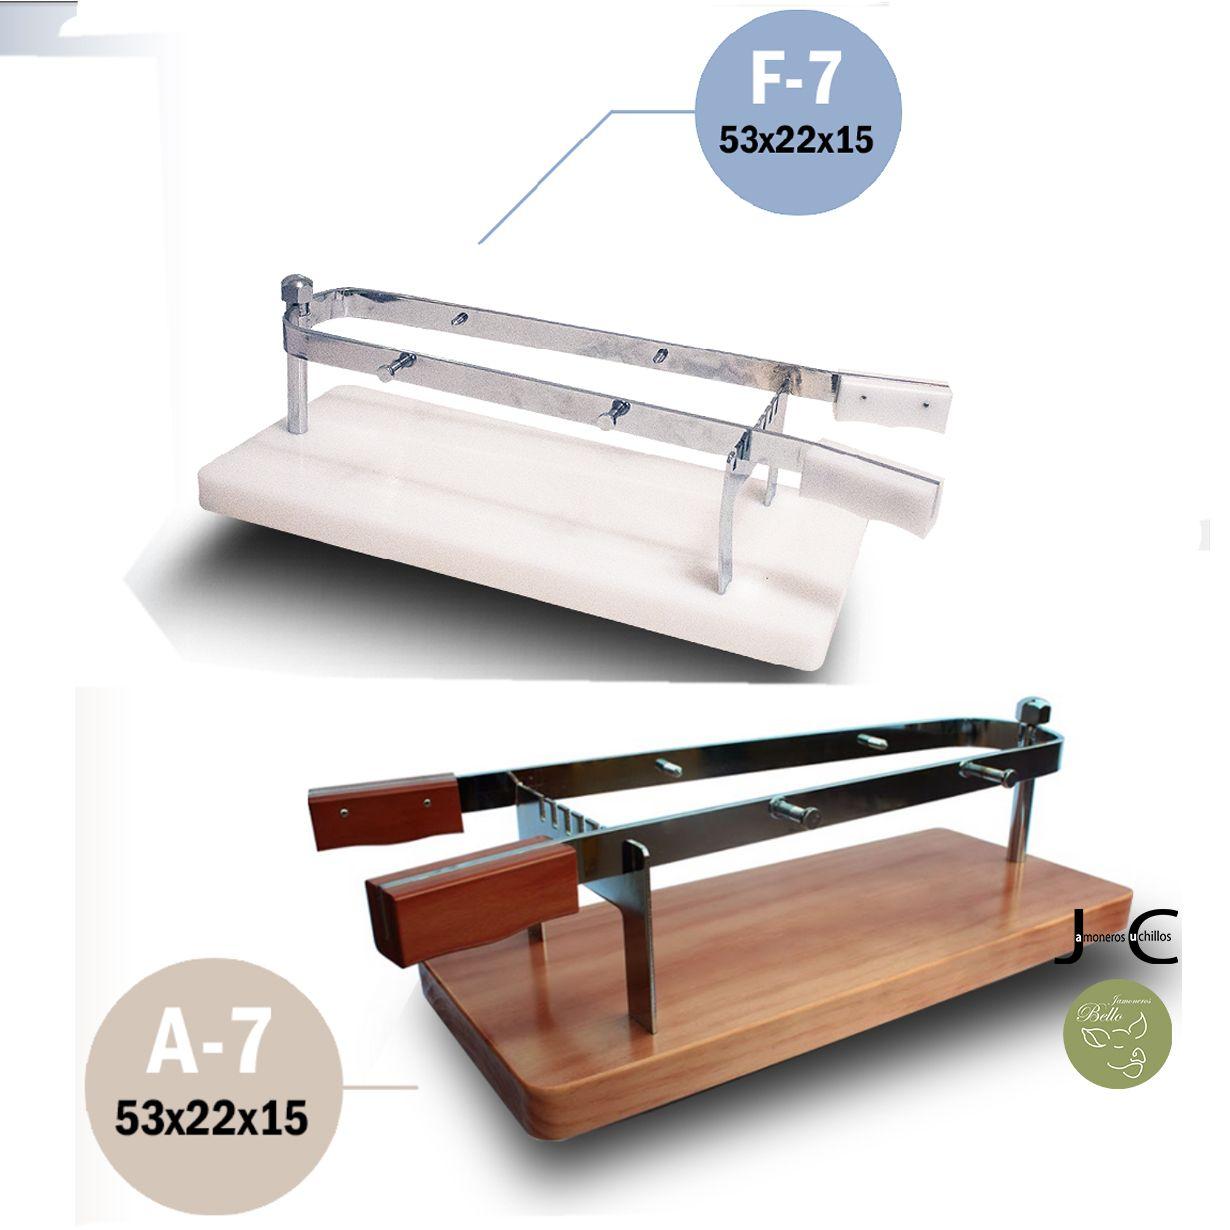 jamonero bello pinza madera fibra A-7_F7